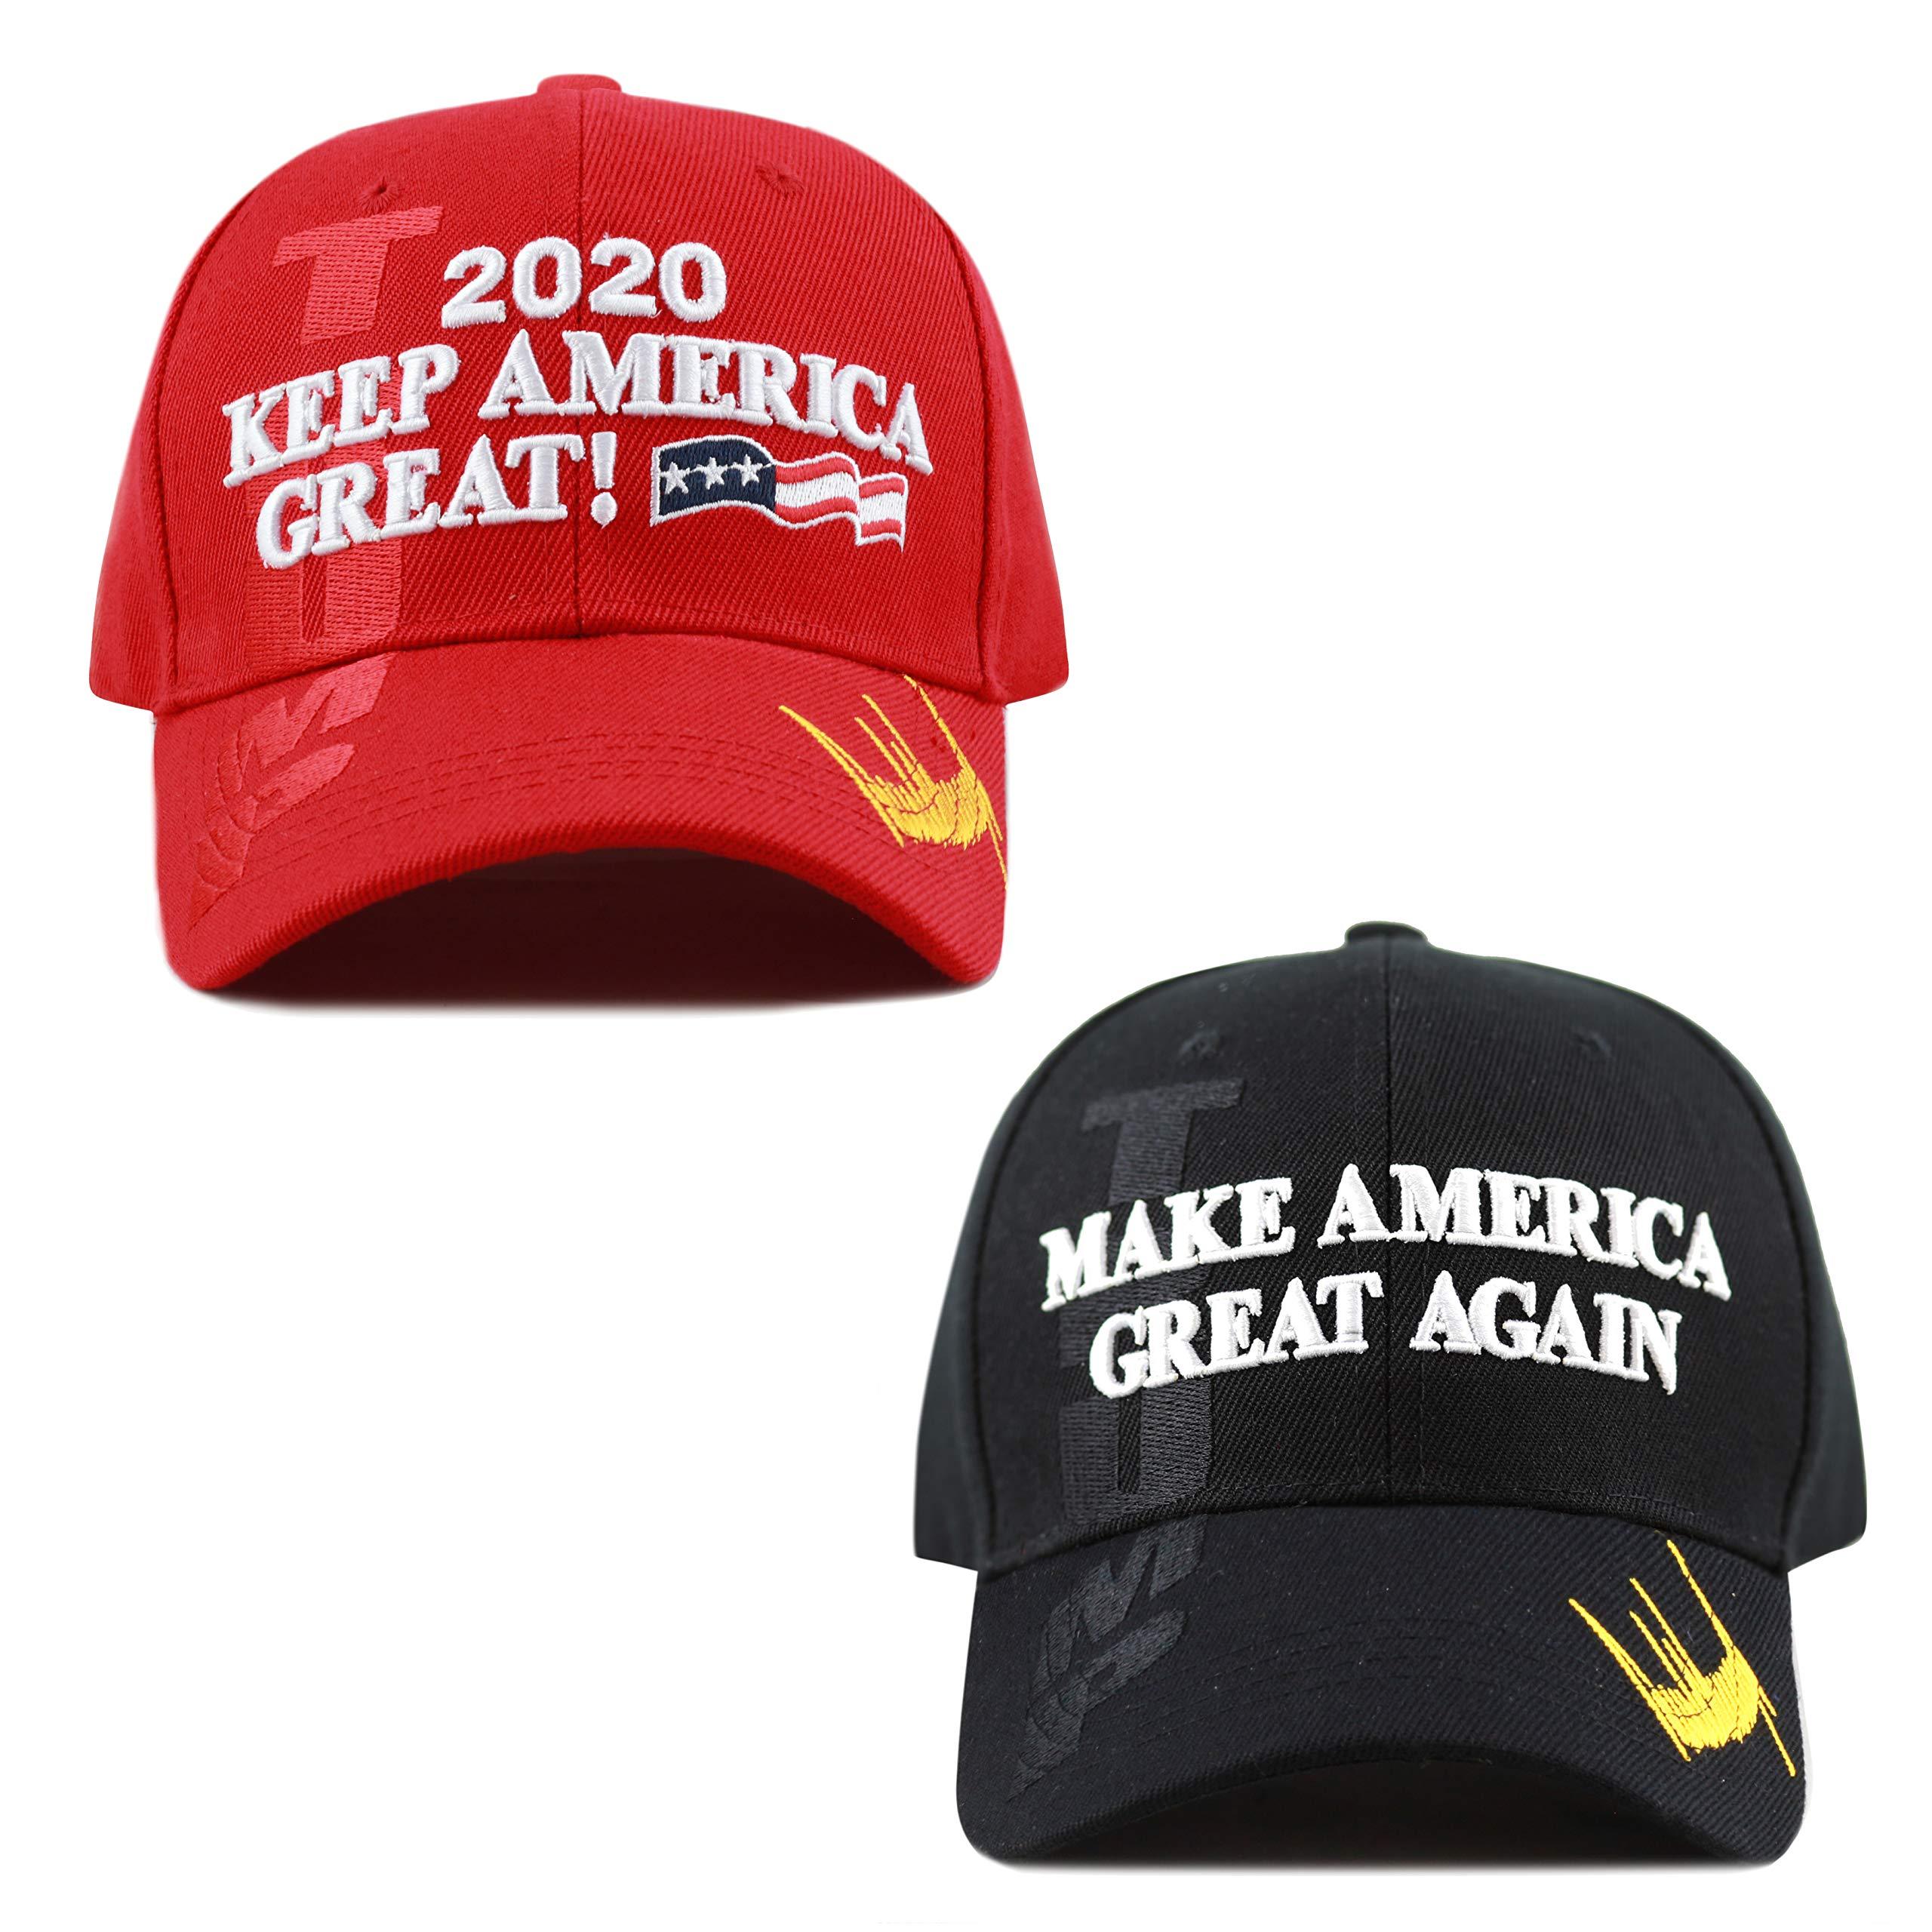 THE HAT DEPOT Exclusive Donald Trump Slogan Keep America Great/Make America Great Again 3D Cap (KAG Combo - BK)